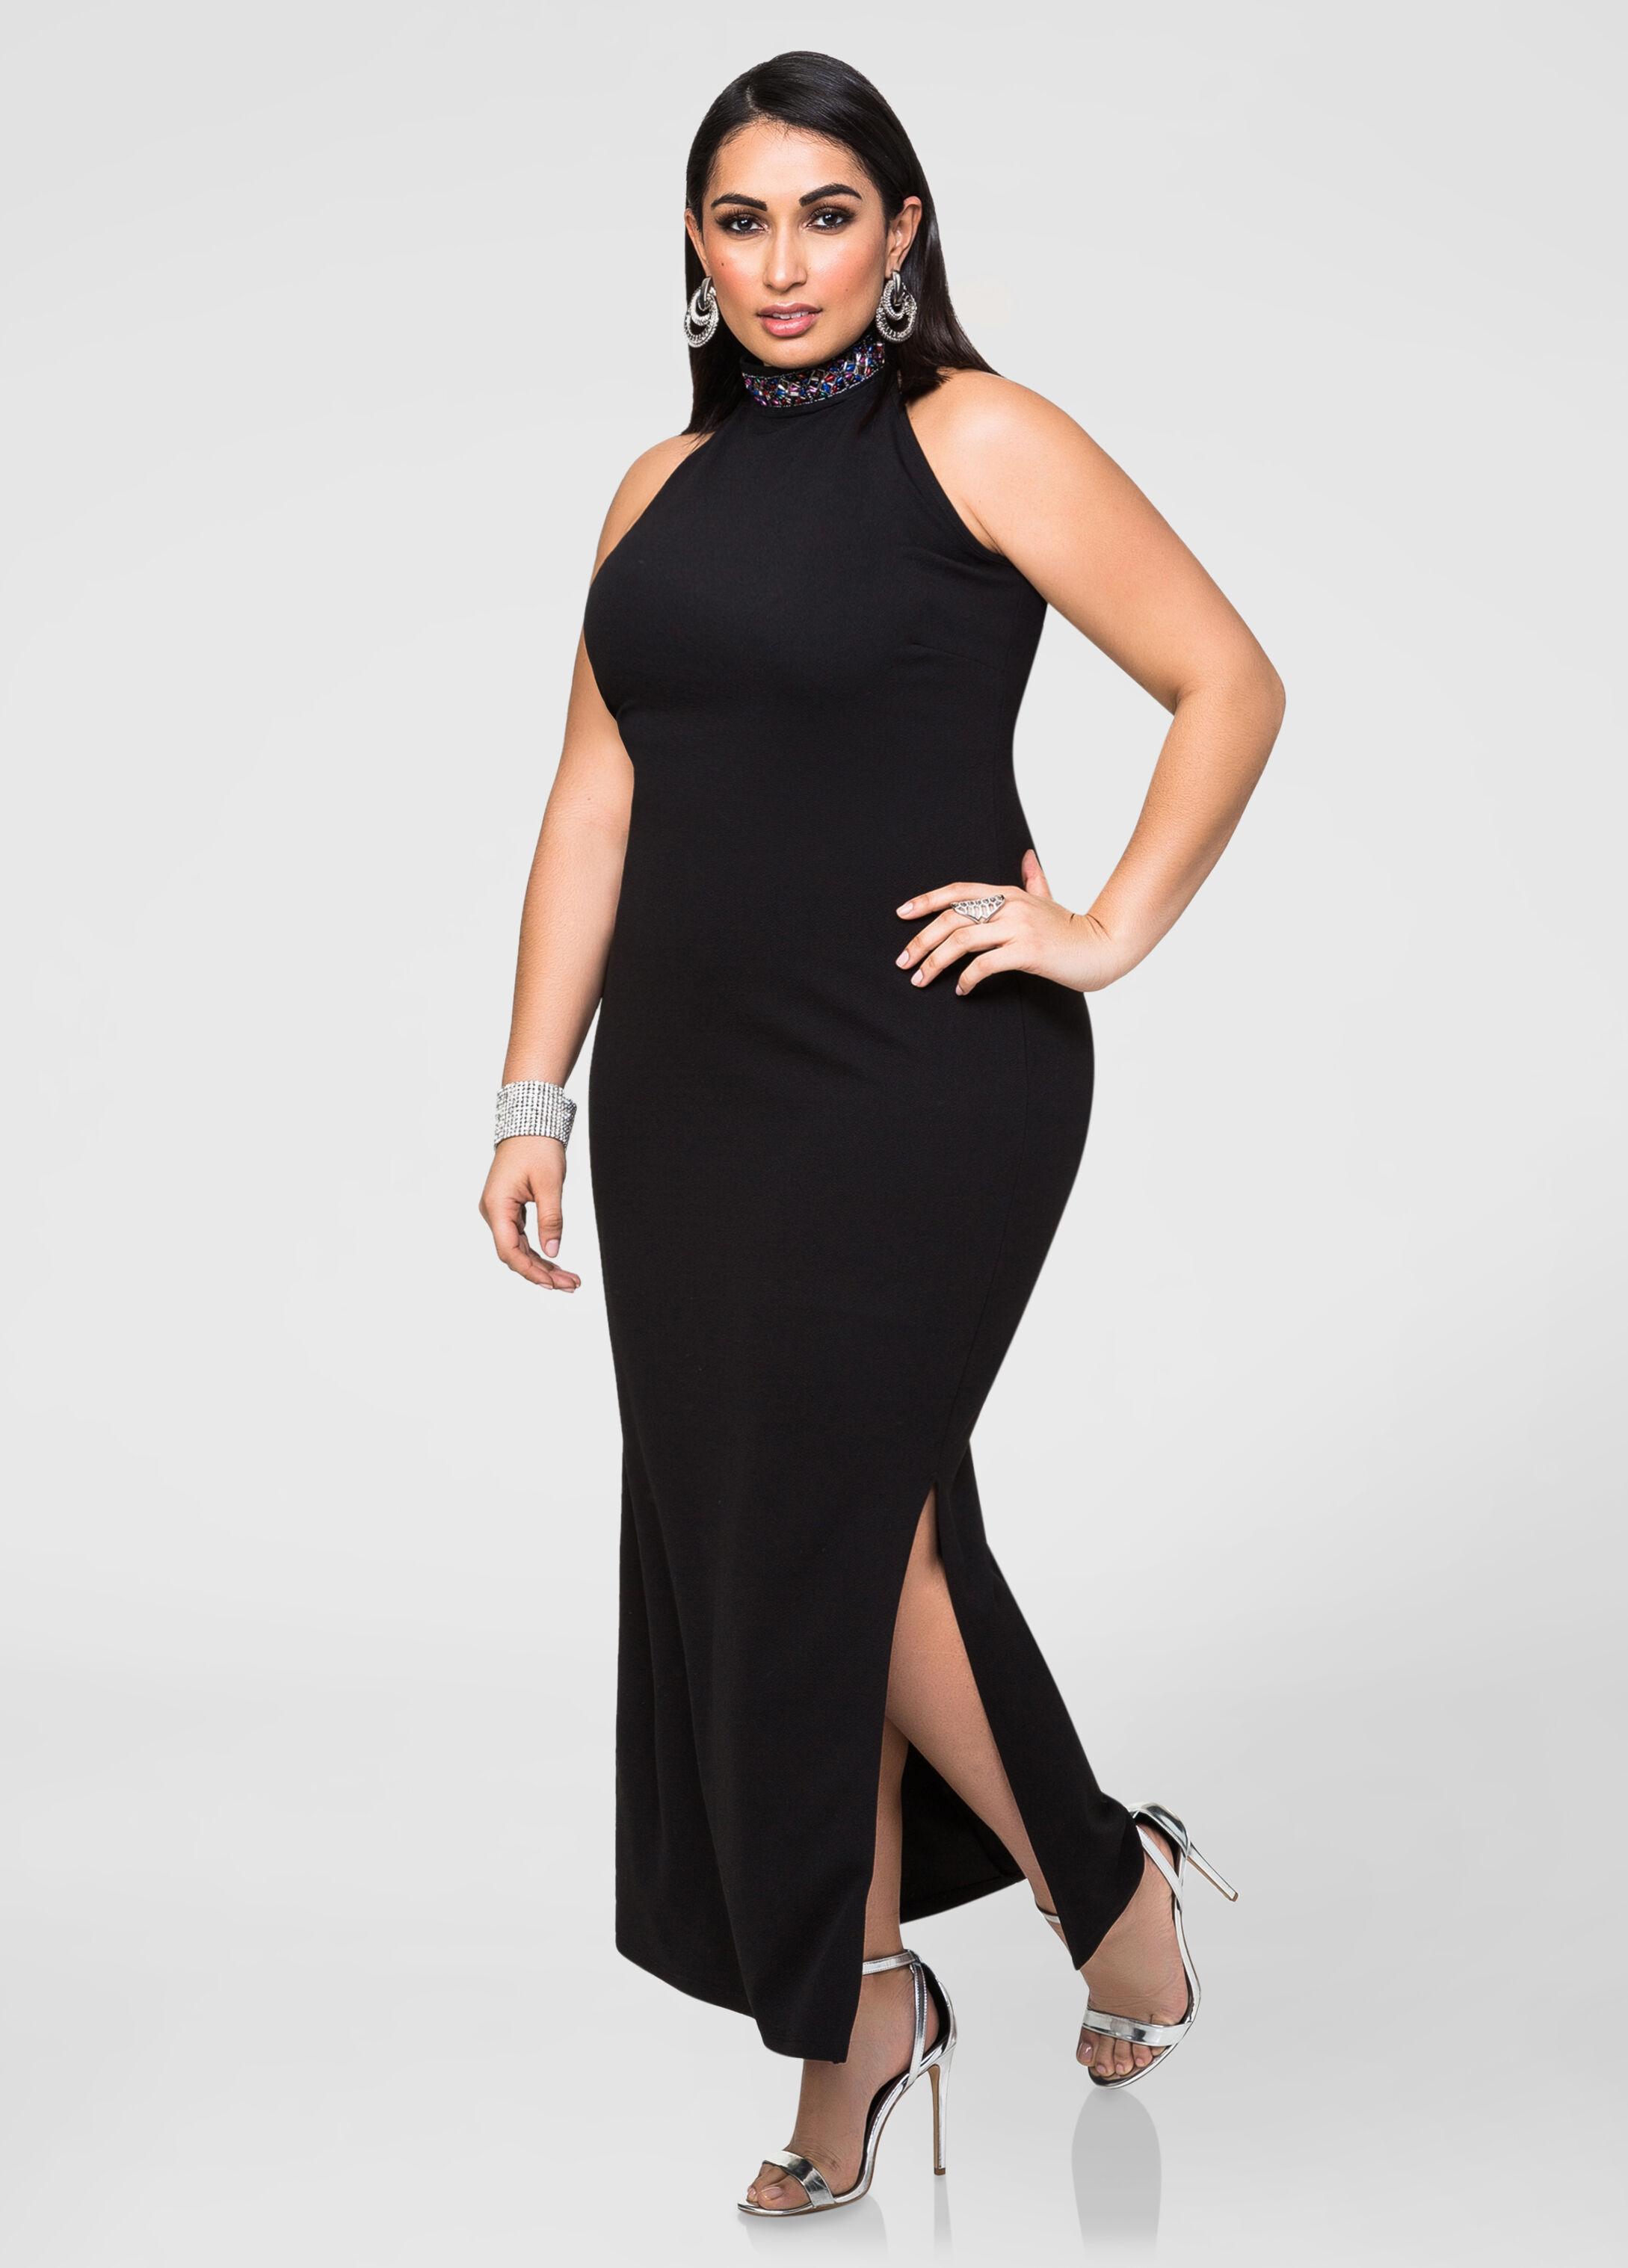 Beaded mock neck maxi dress plus size tops ashley stewart for Ashley stewart wedding dresses